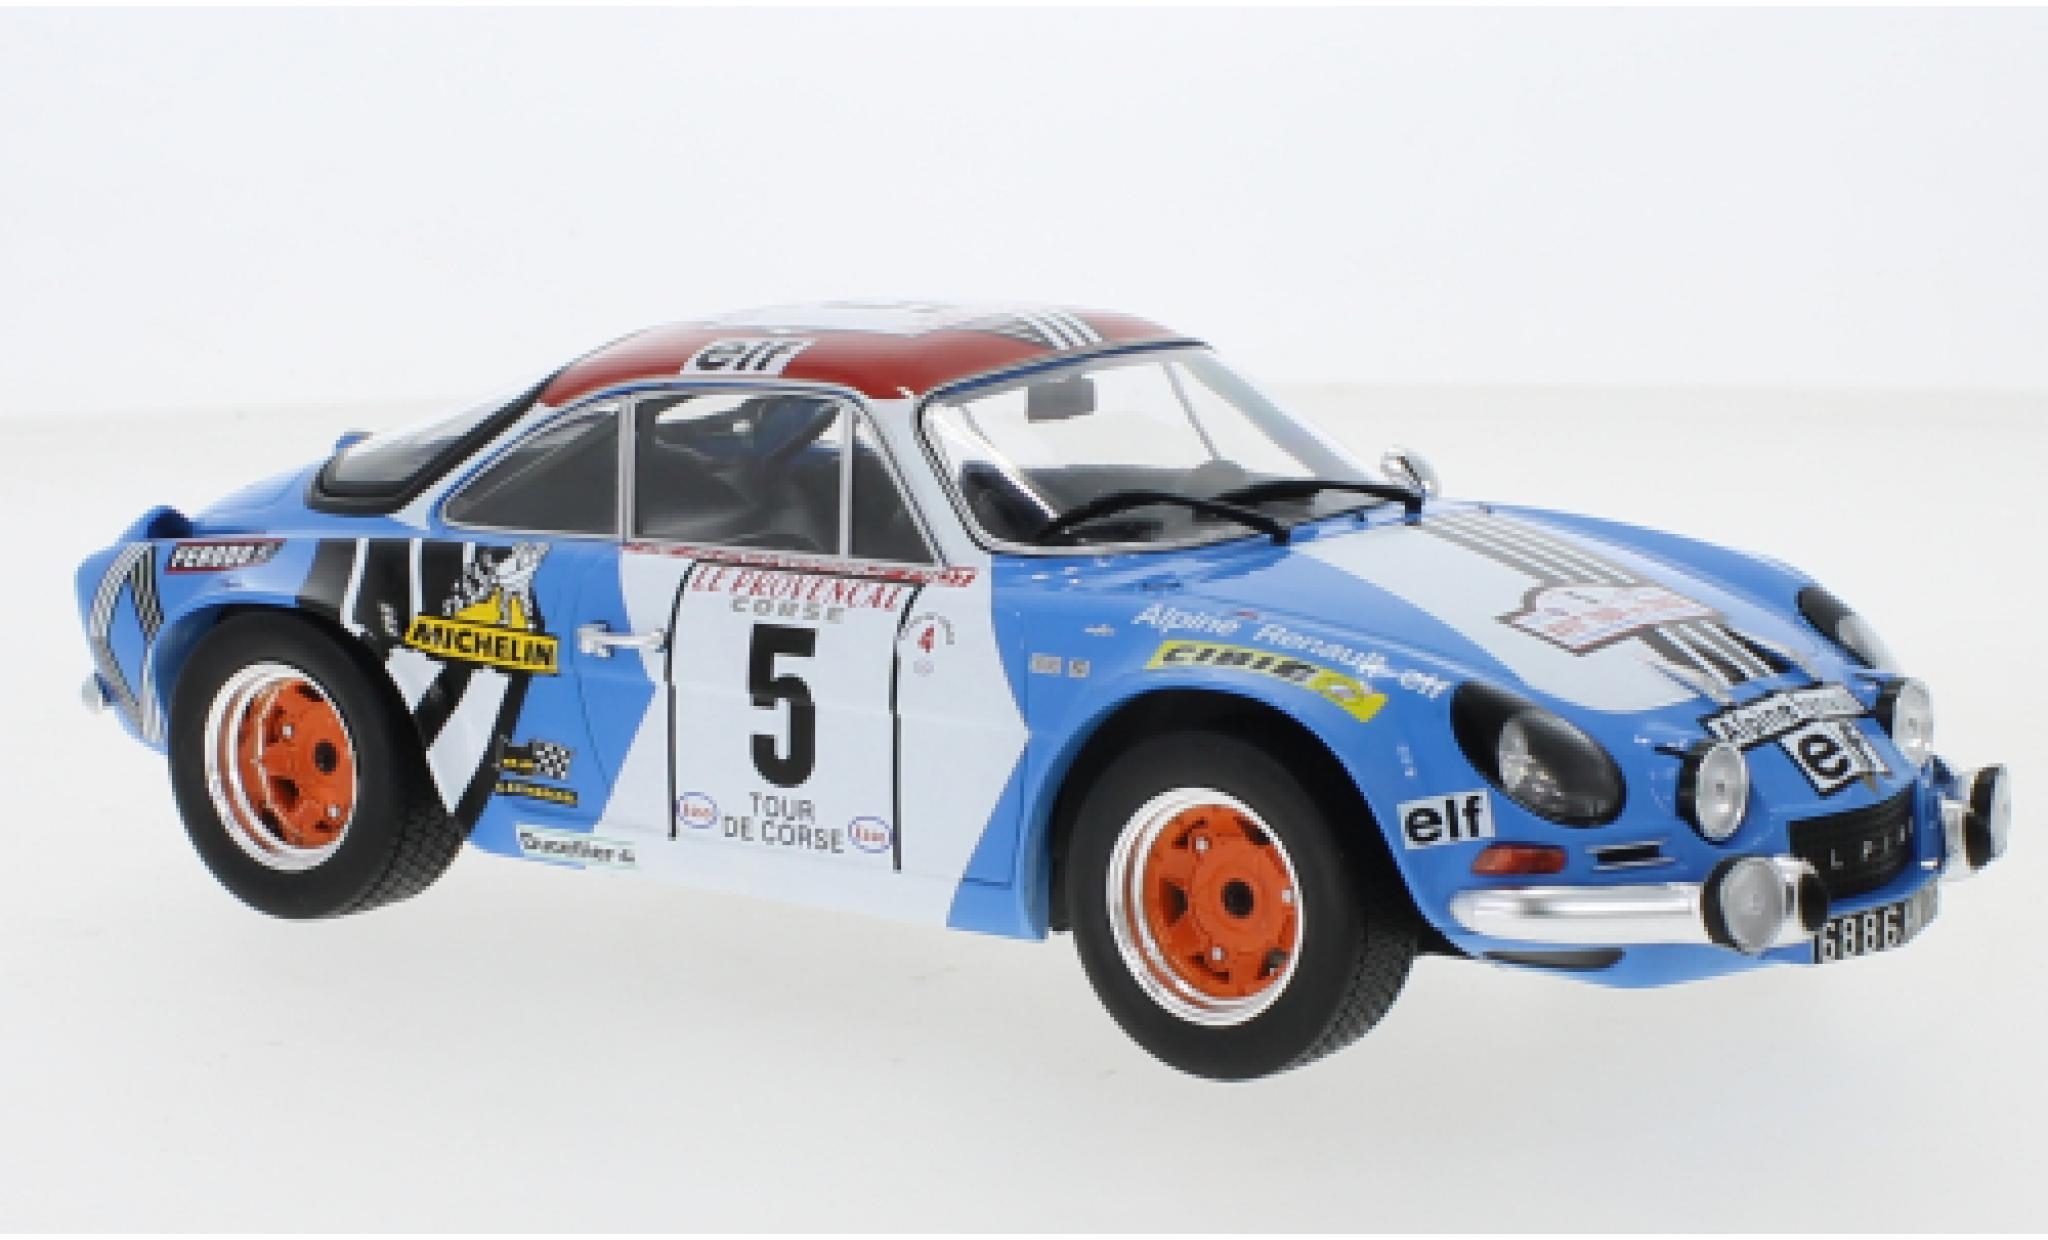 Alpine A110 1/18 IXO Renault No.5 Tour de Corse 1973 J.F.Piot/J.De Alexandris